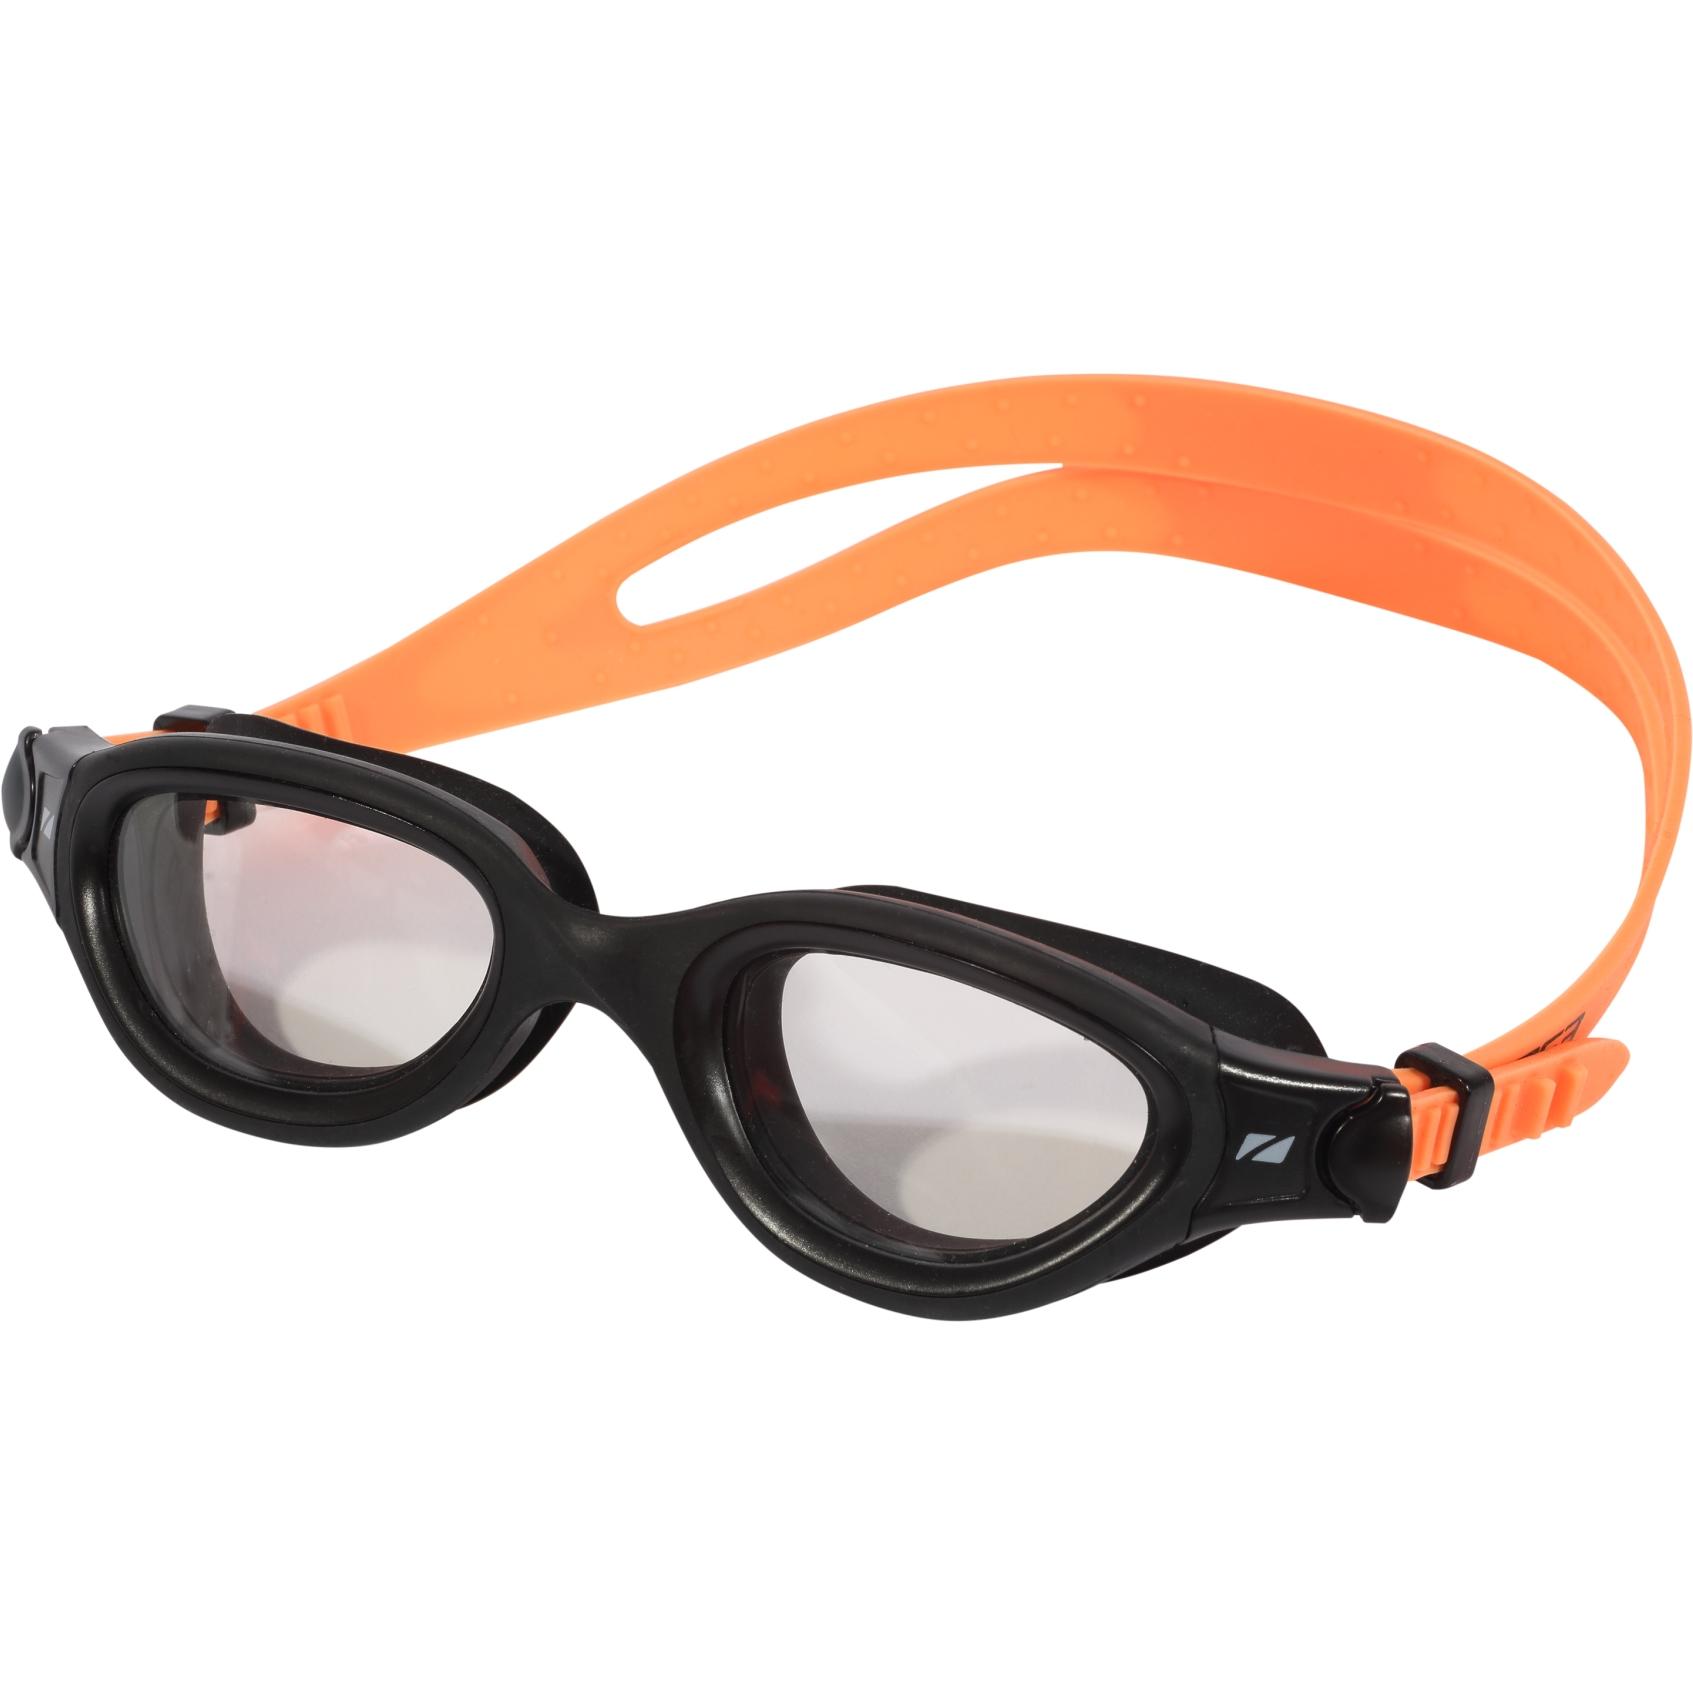 Zone3 Venator-X Schwimmbrille - Photochromatic - black/neon orange - photochromatic lens